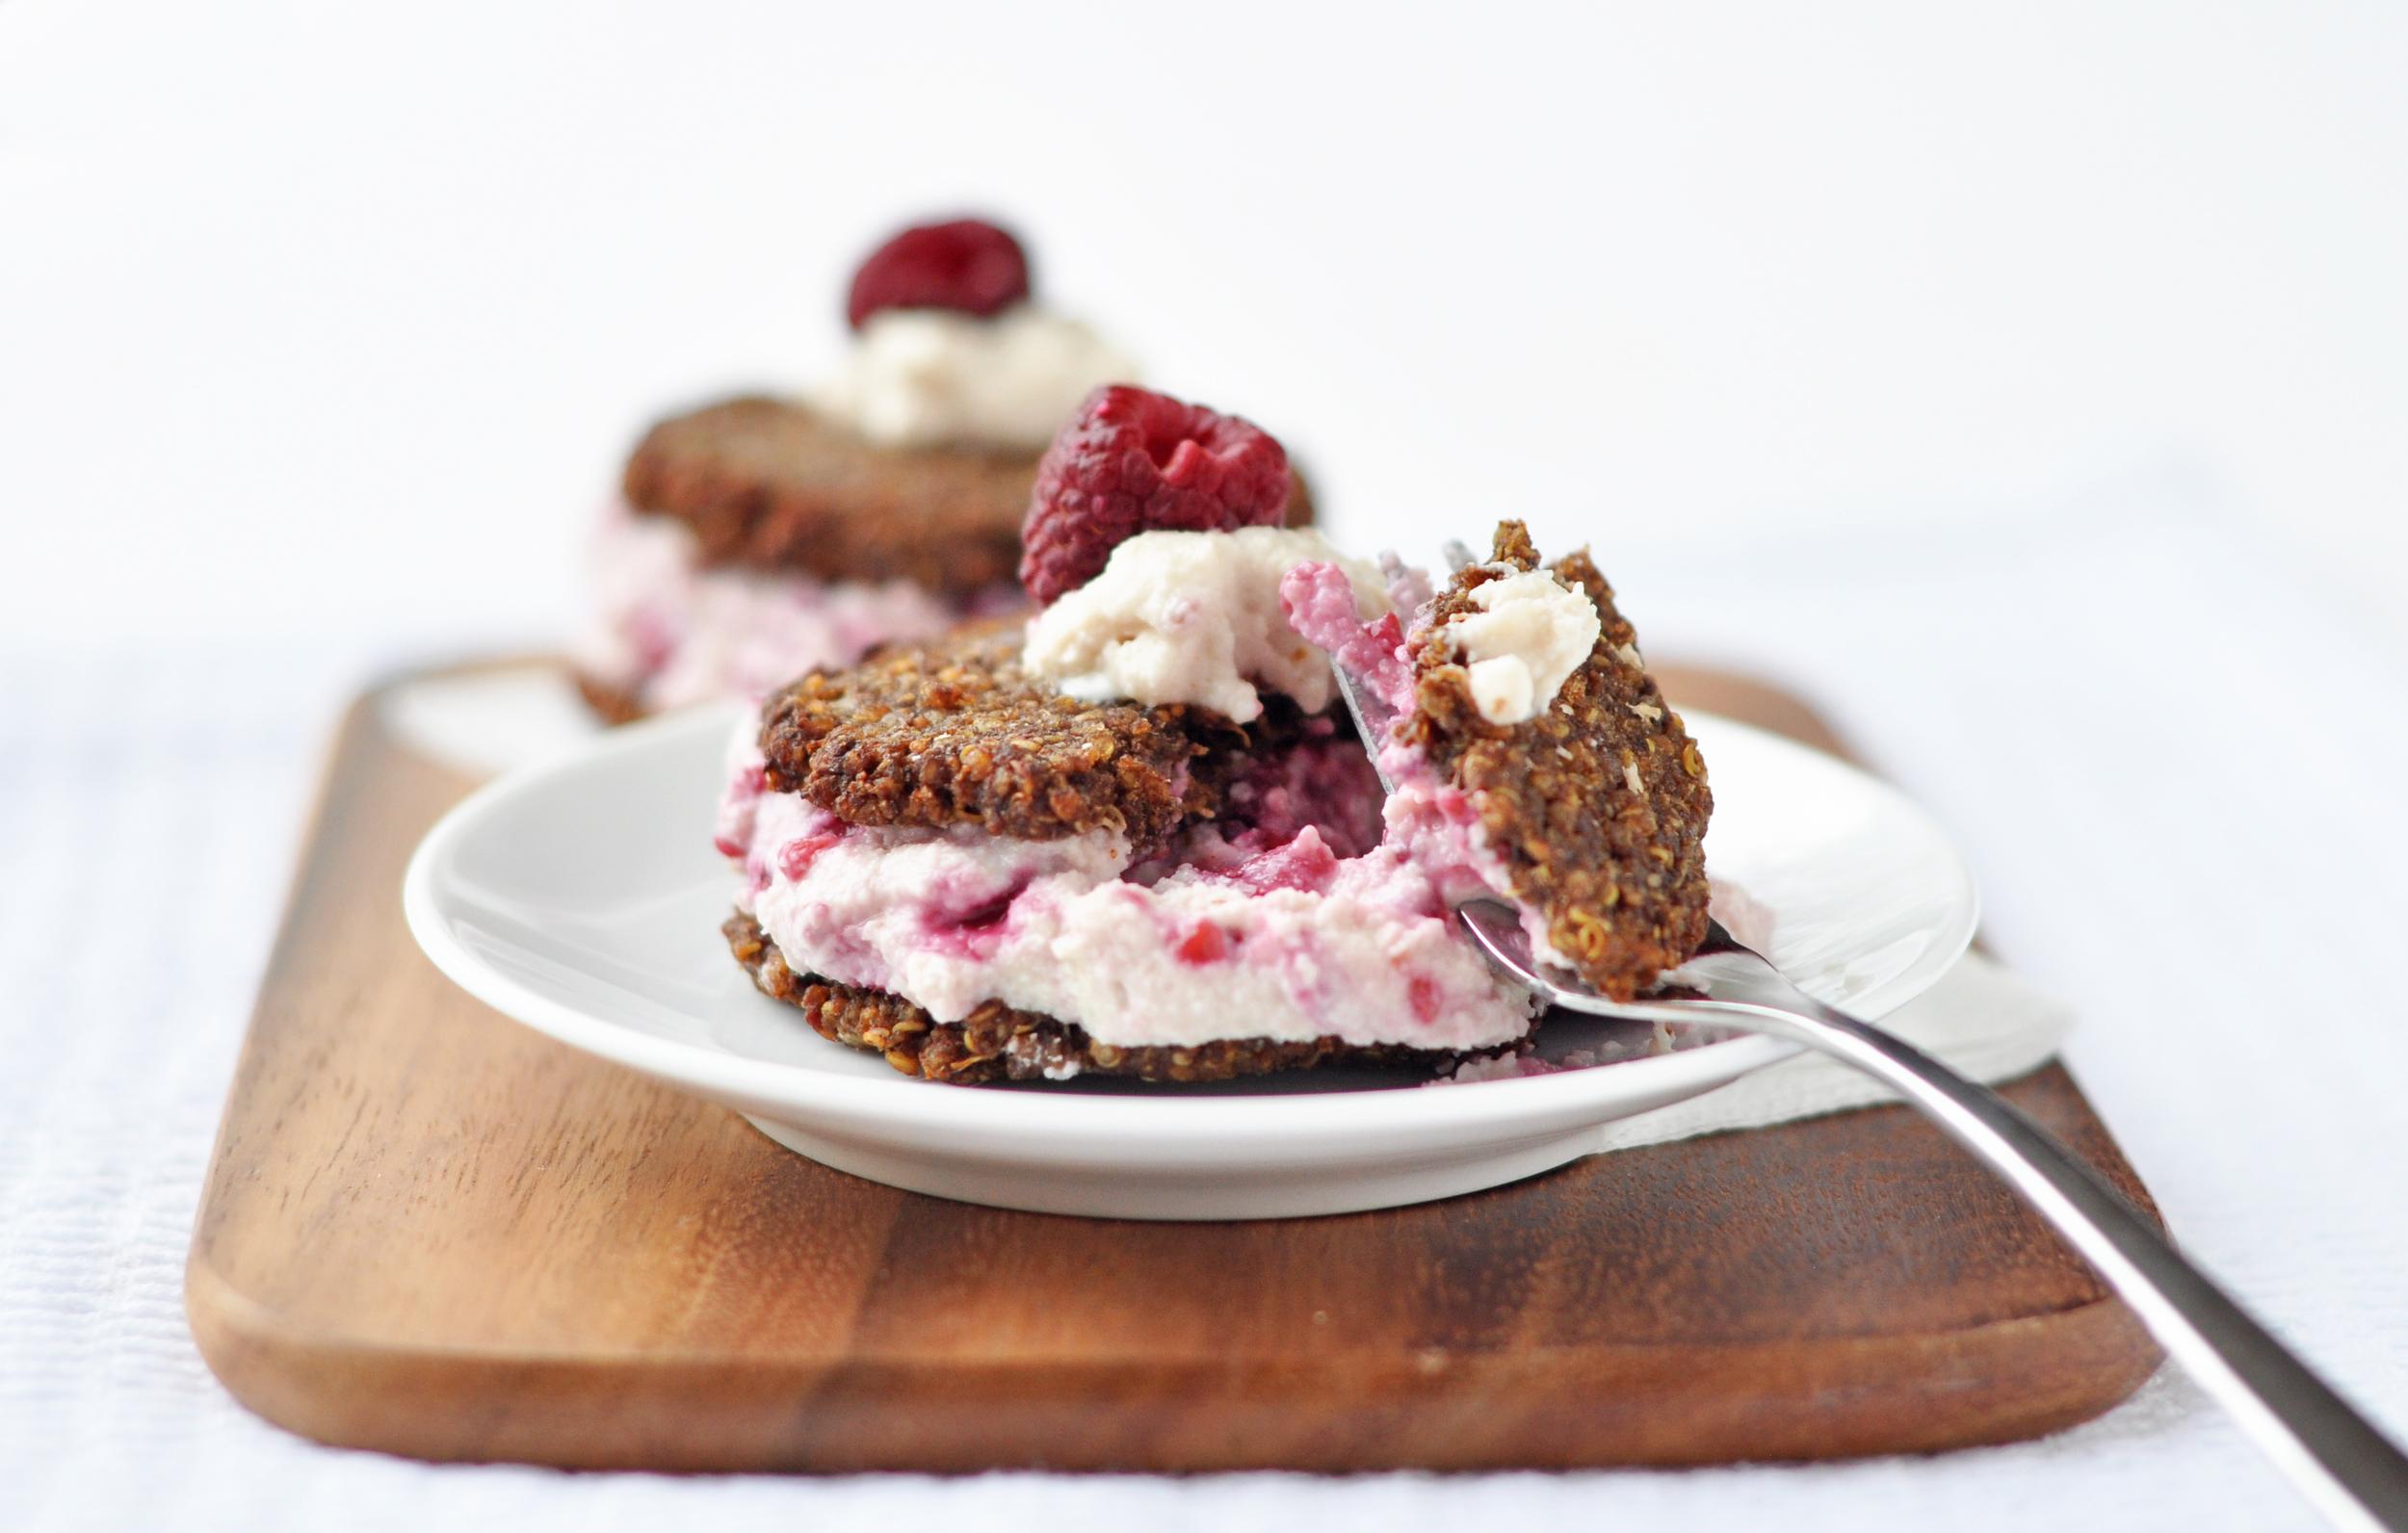 quinoa cream sandwich 4.jpg